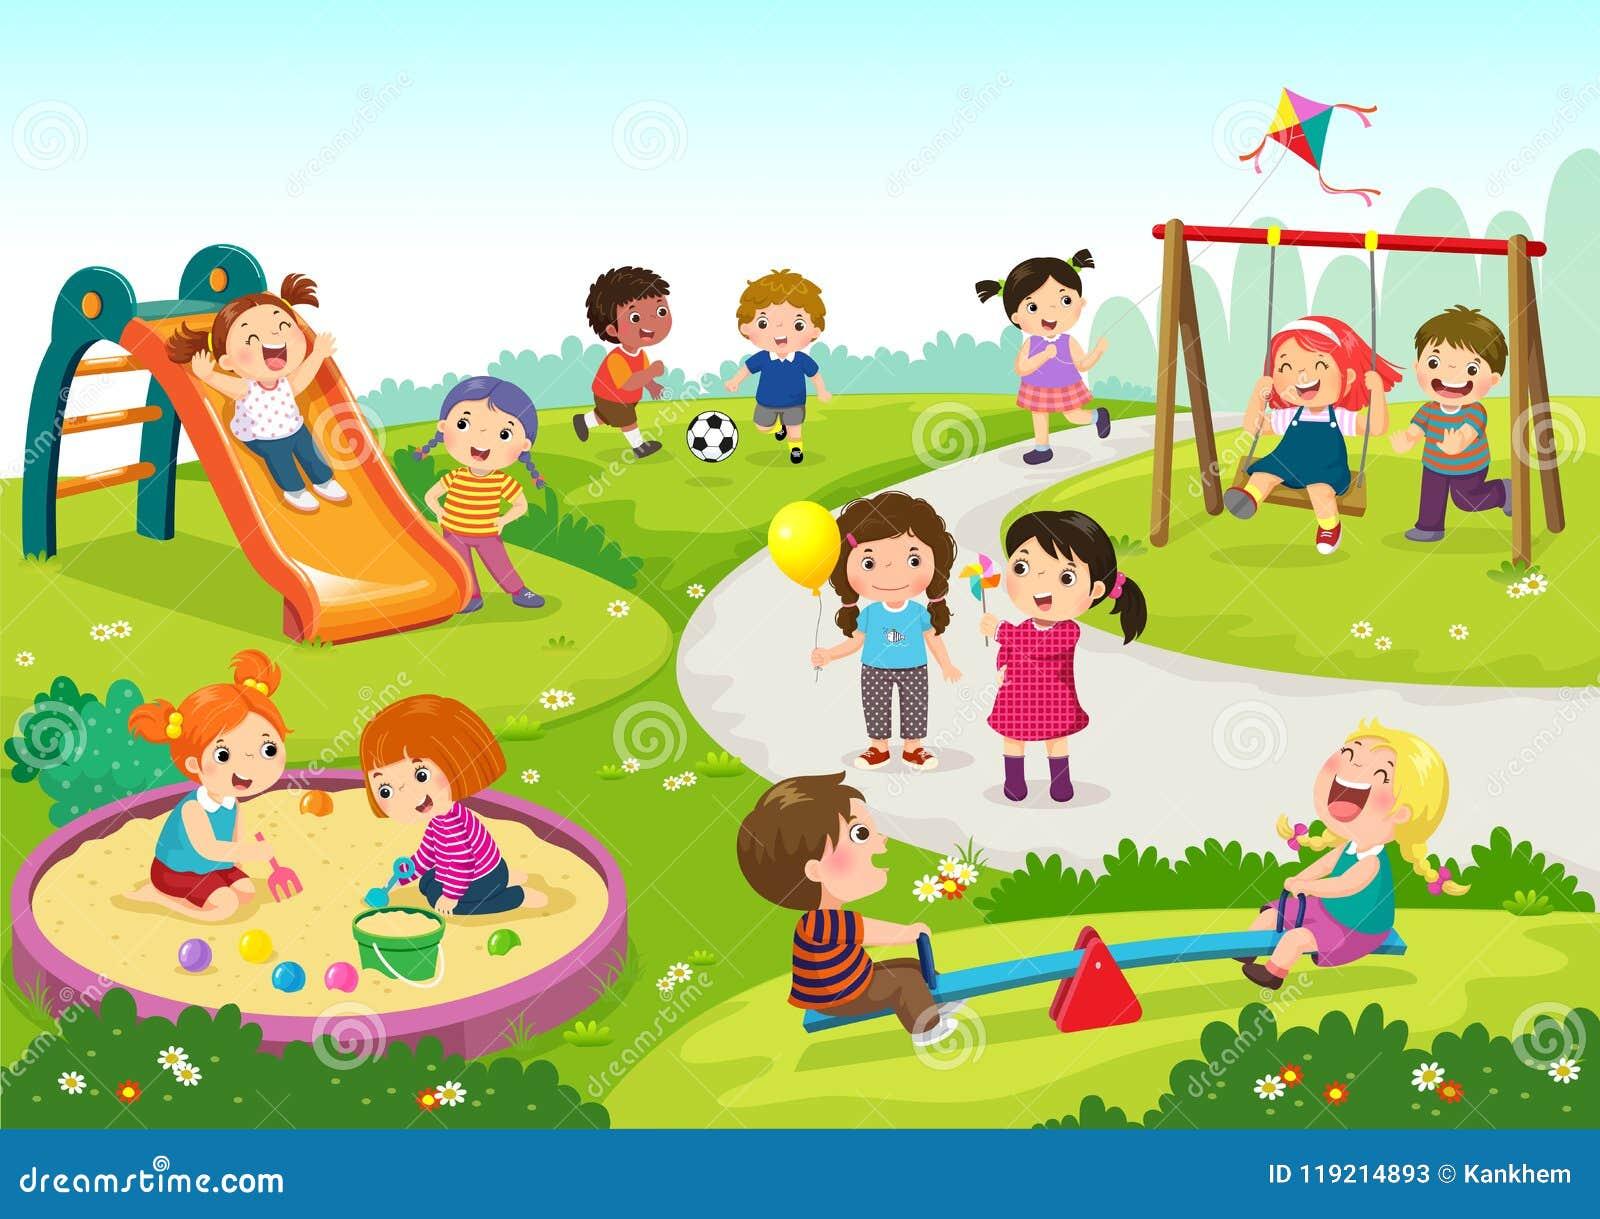 playground cartoons  illustrations  u0026 vector stock images